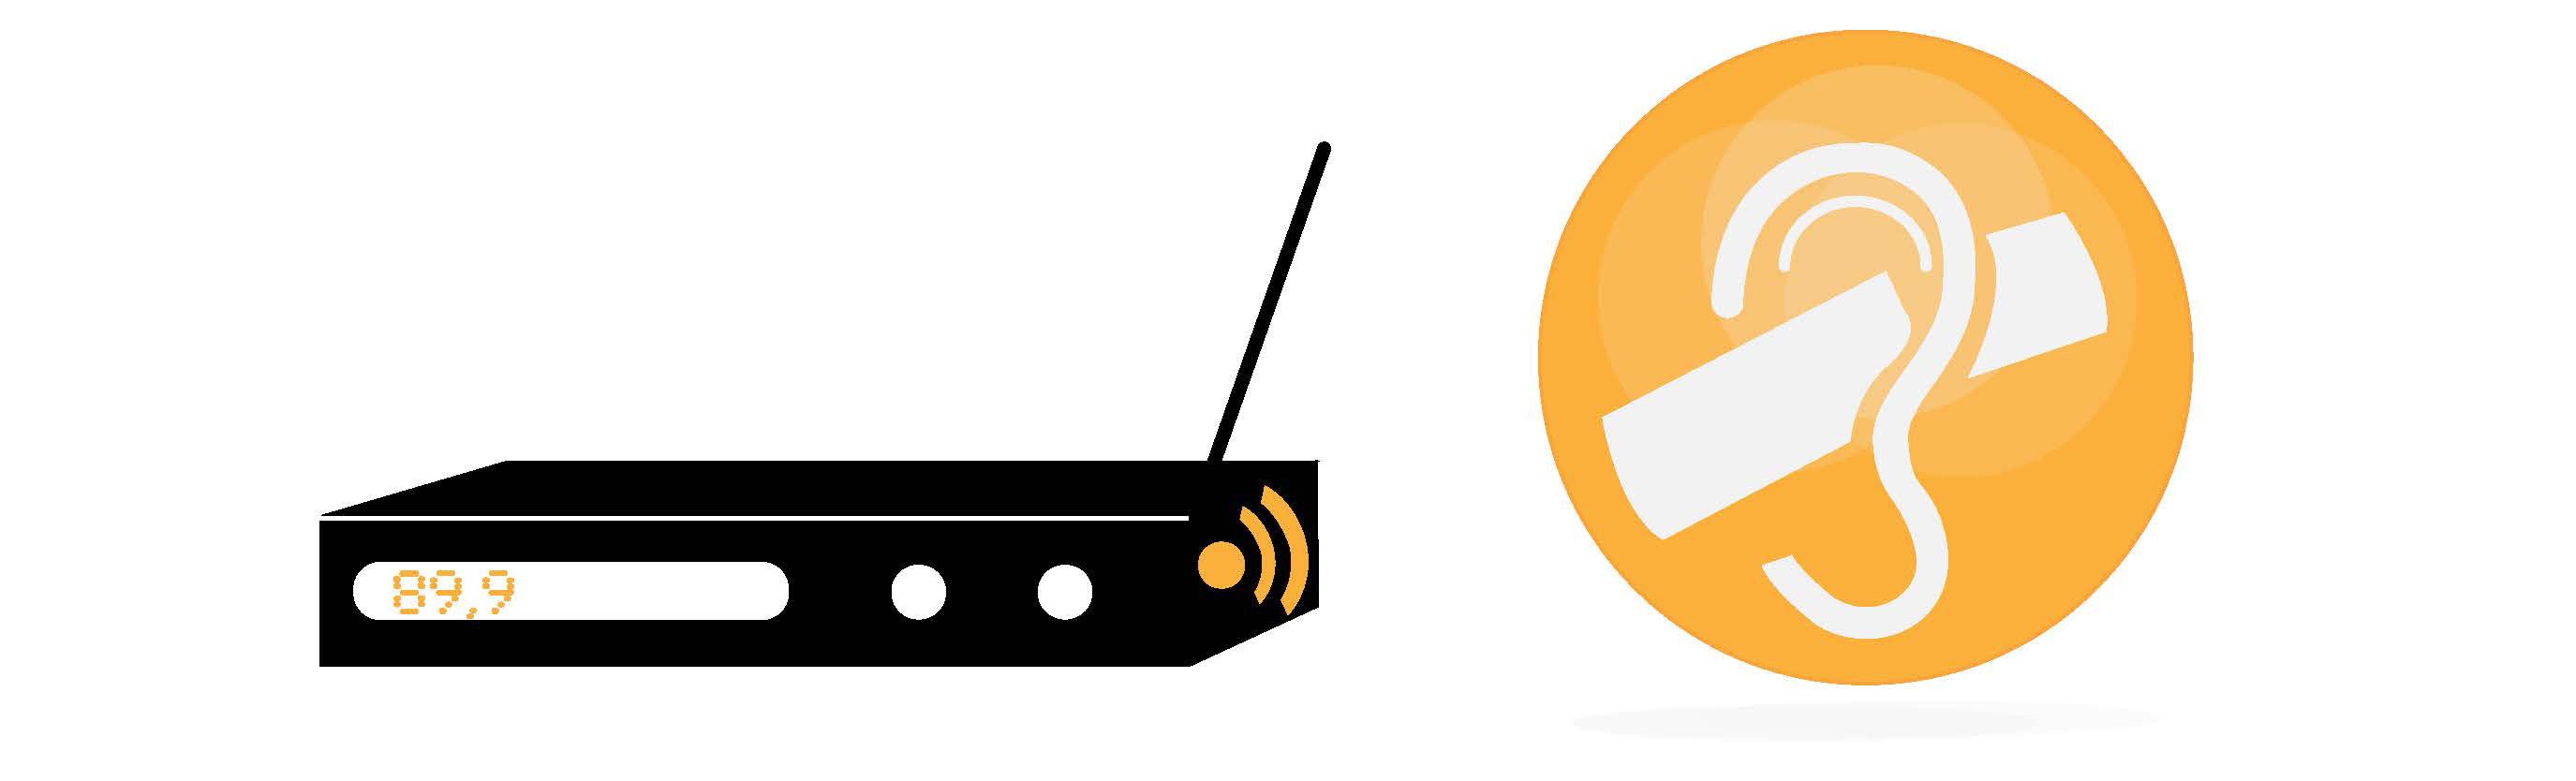 FM transmitters Decade Stades